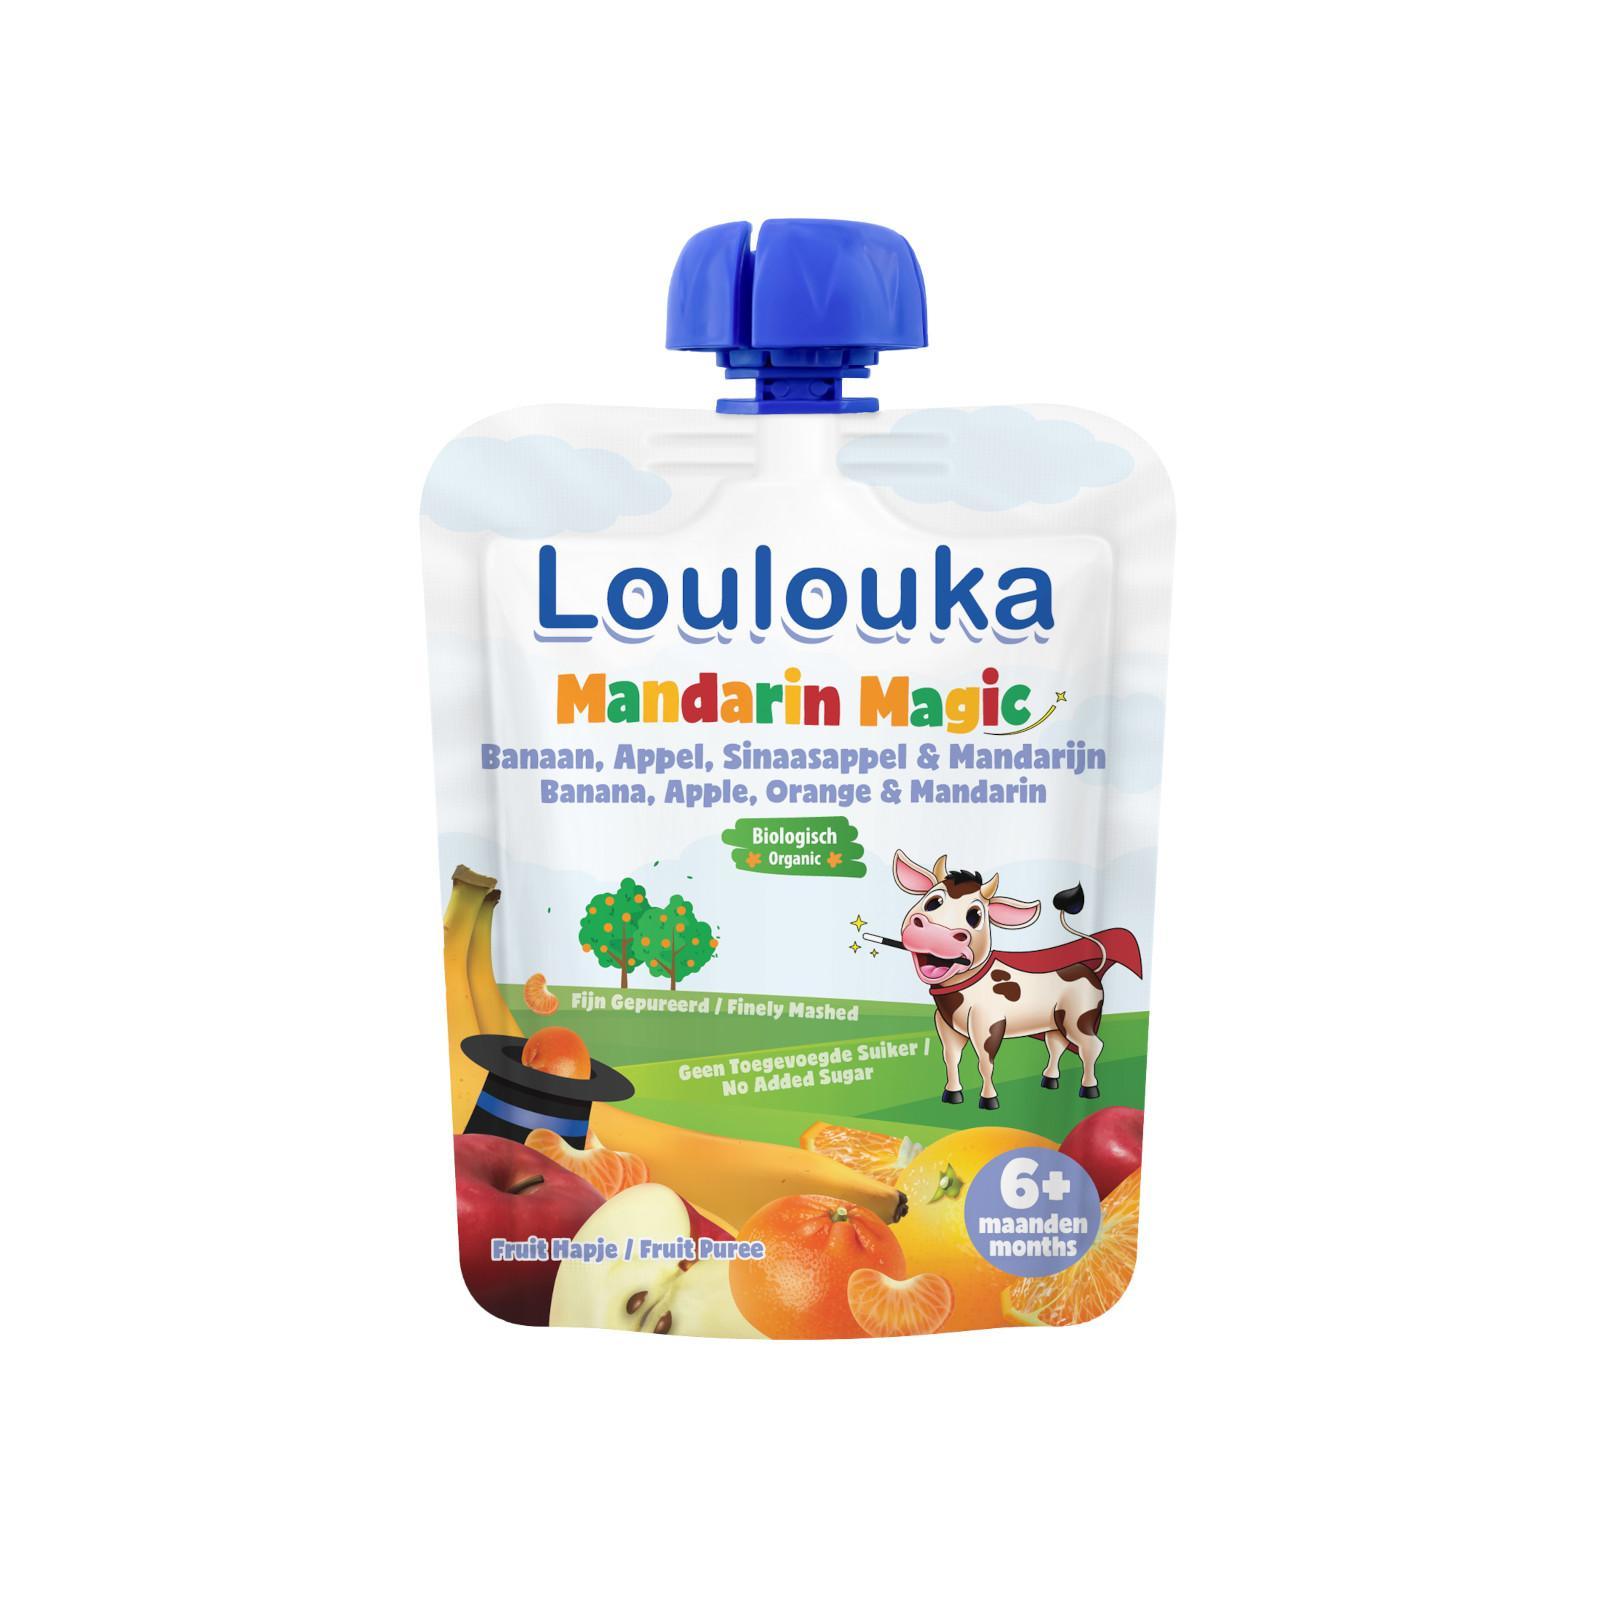 Loulouka Mandarin Magic, ovocný příkrm 90 g